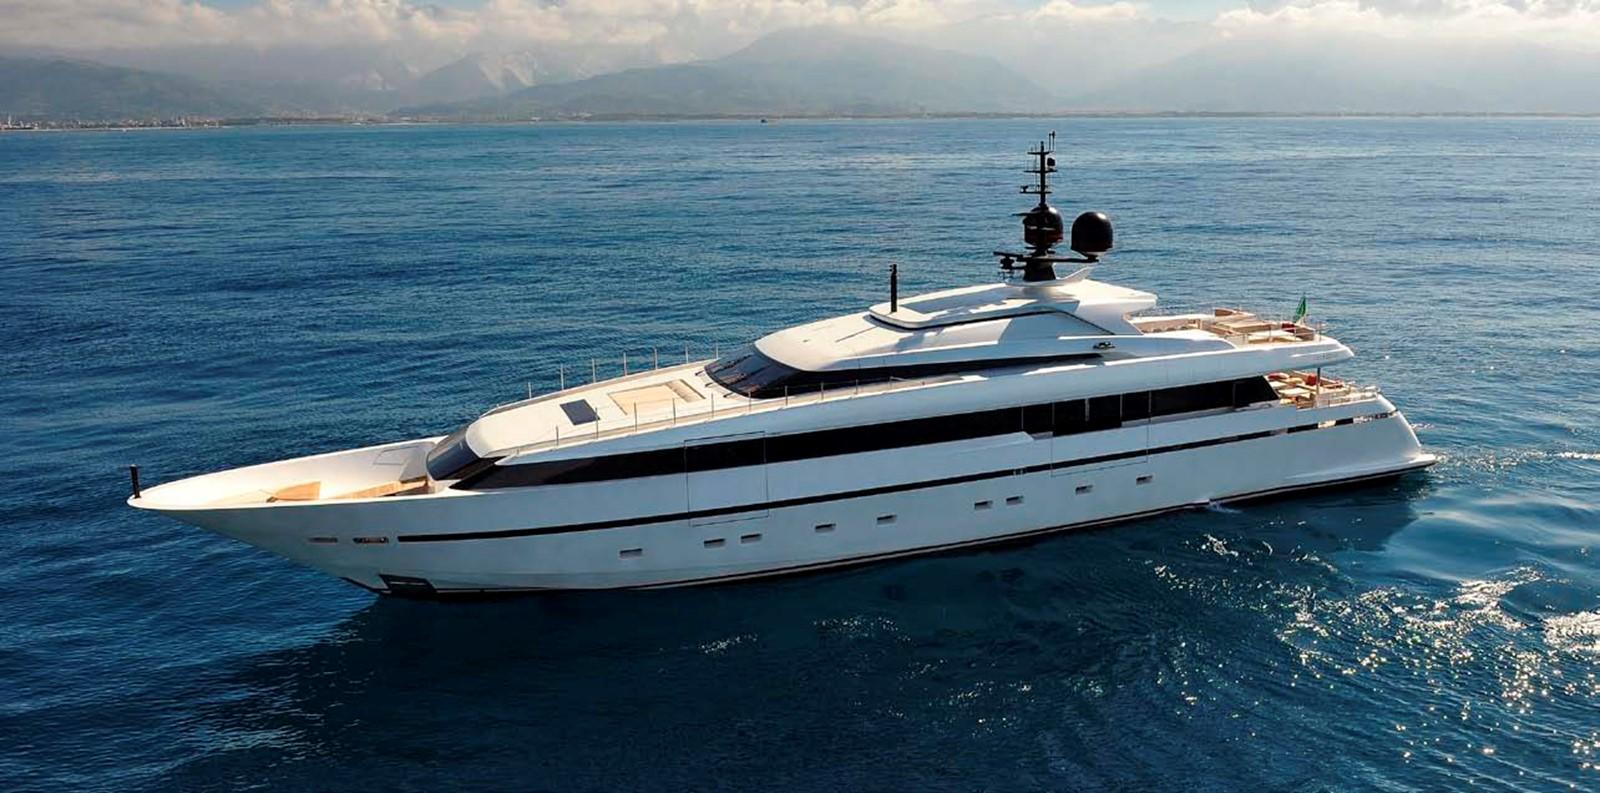 2013 SANLORENZO 40ALLOY Motor Yacht 1356918